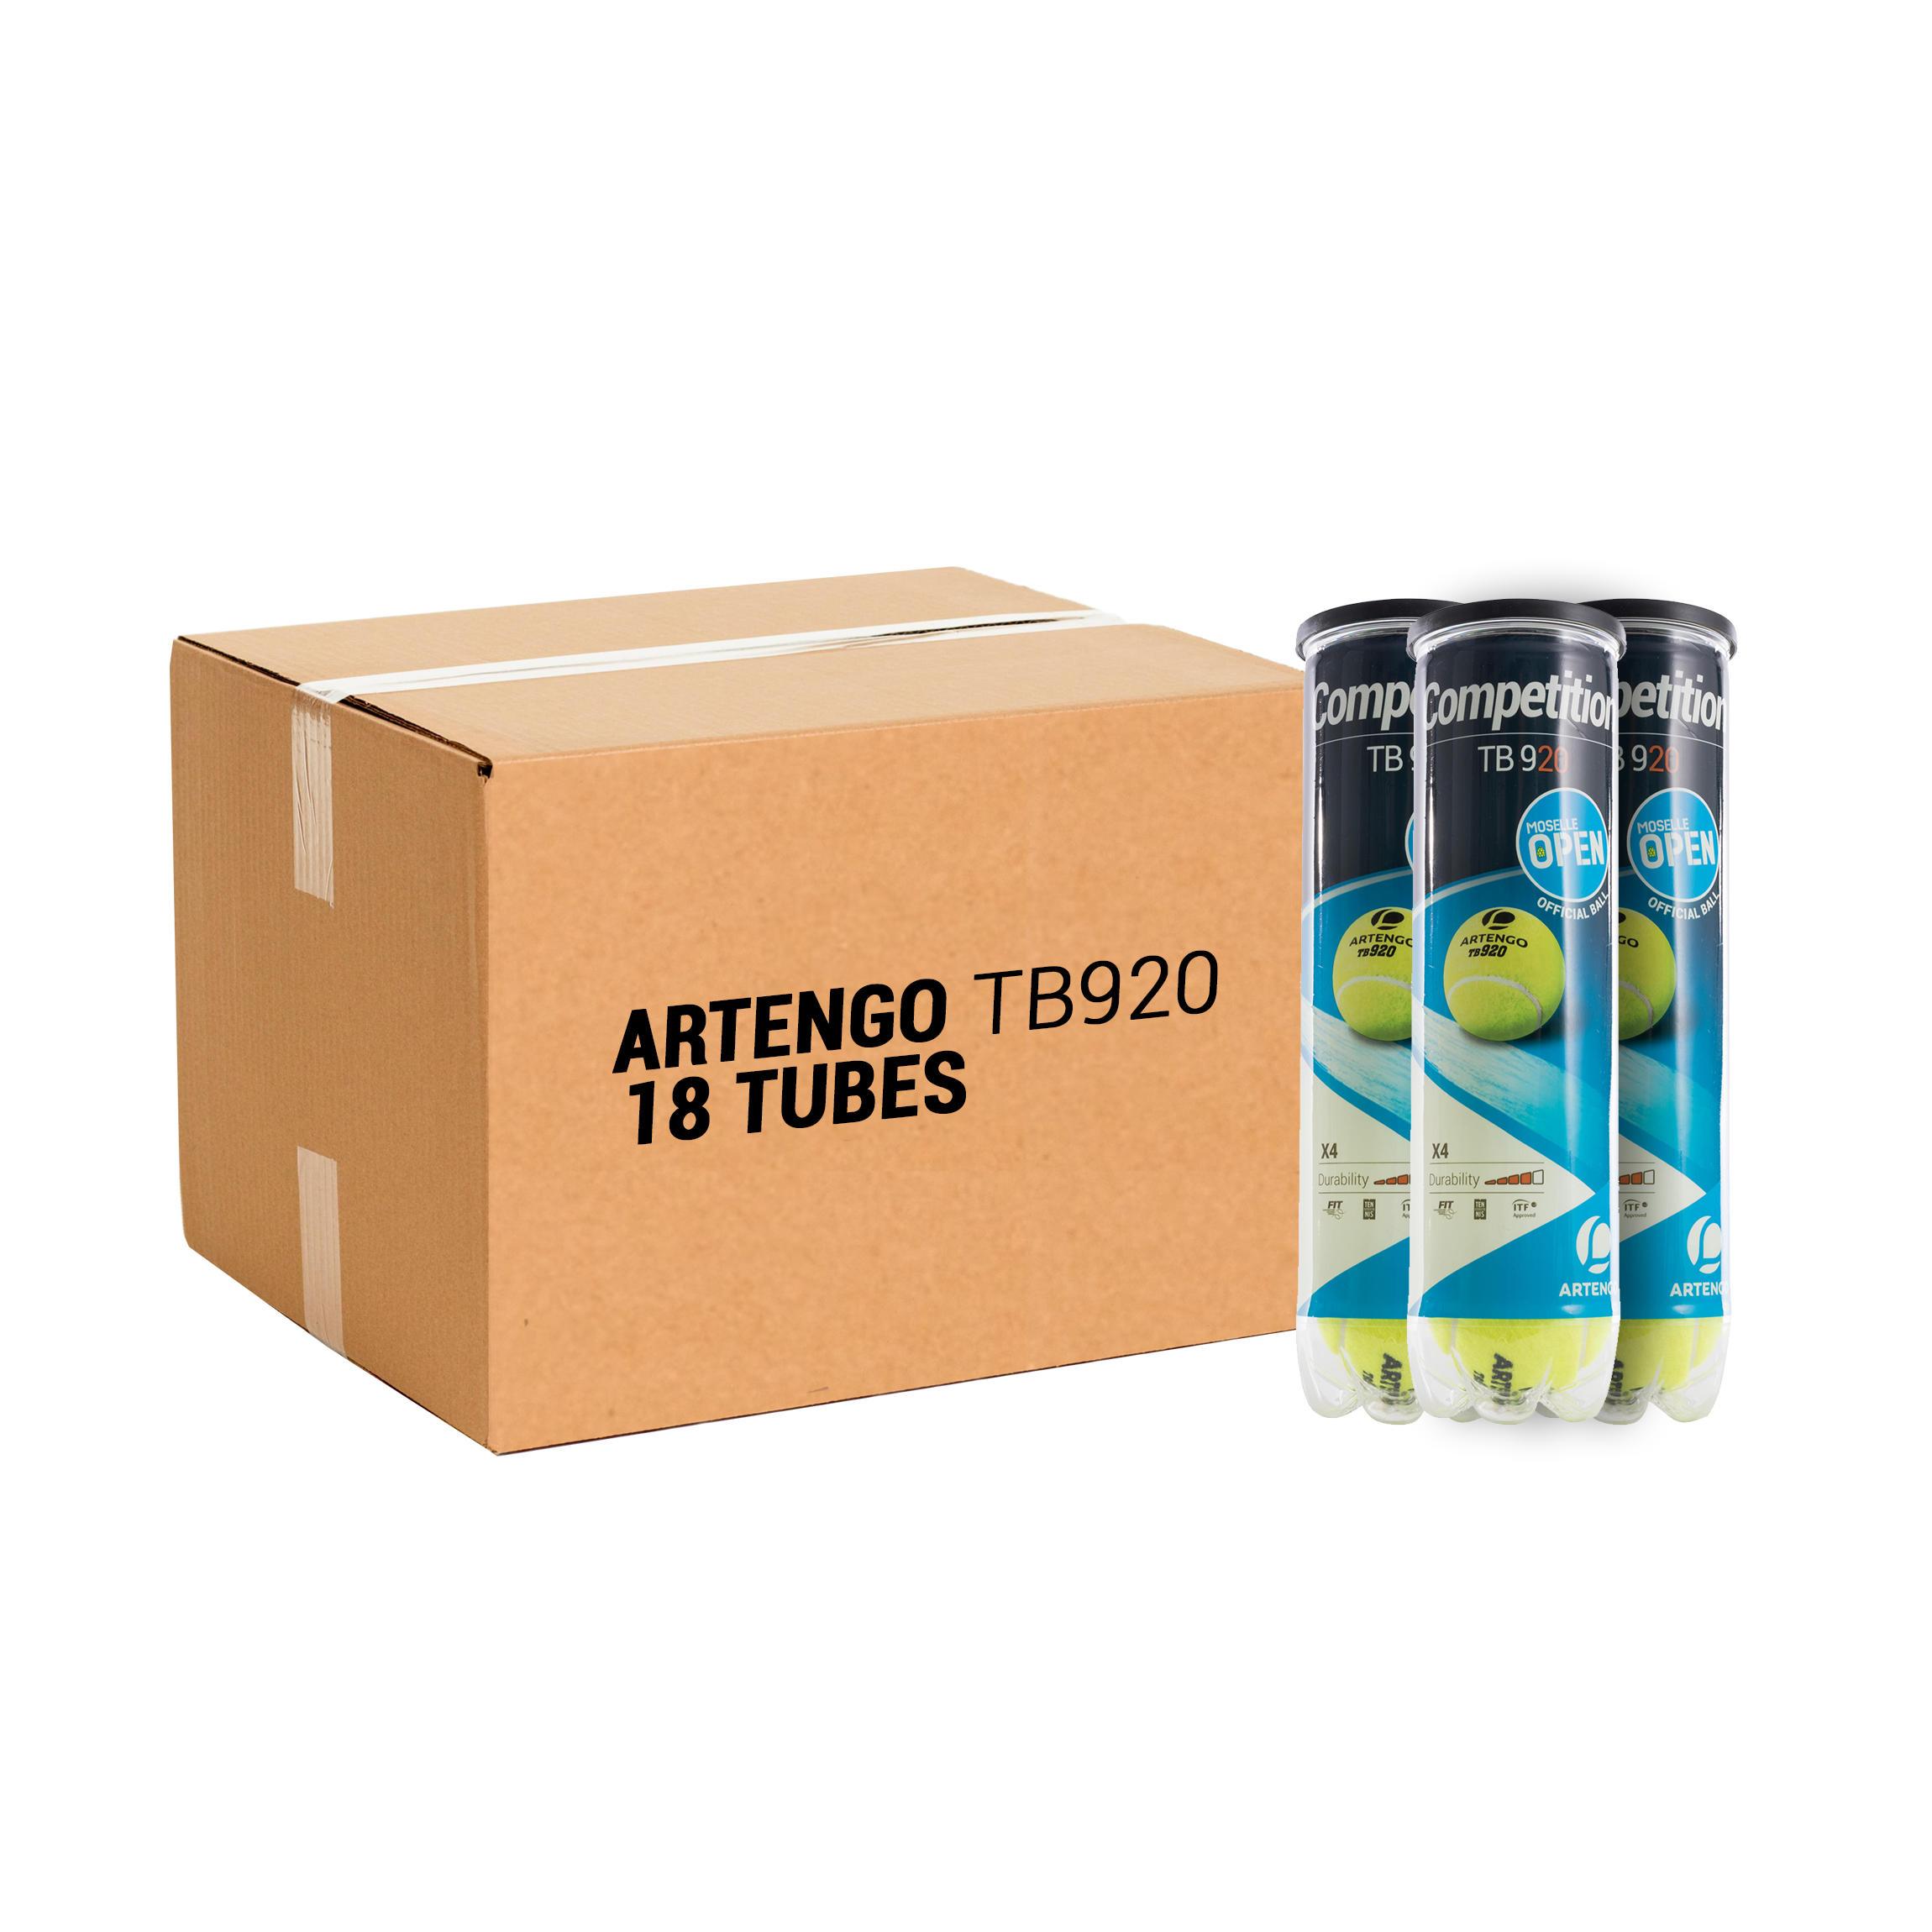 ARTENGO BALLE DE TENNIS TB920 *4 PACK *18 JAUNE - ARTENGO - Taille unique